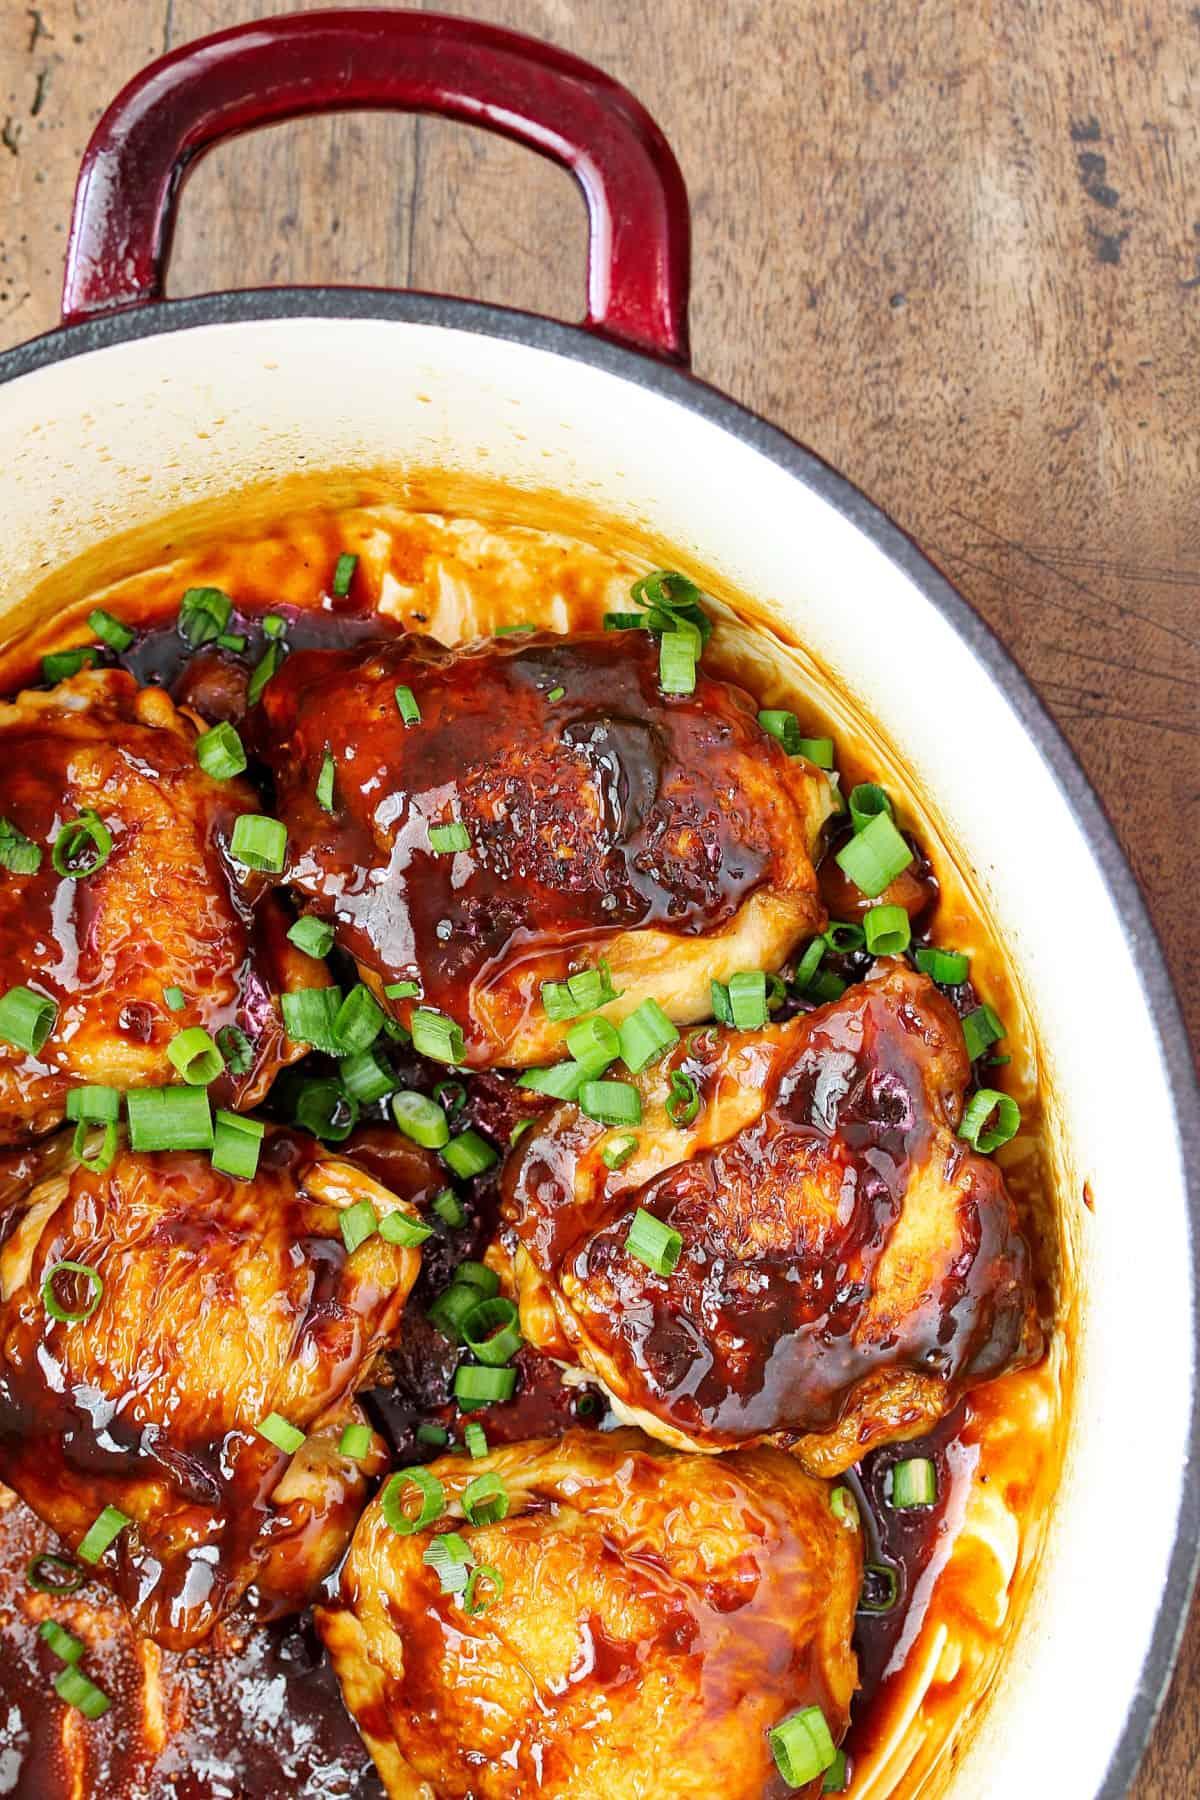 Garlic and Ginger Caramel Chicken Thighs in pot.